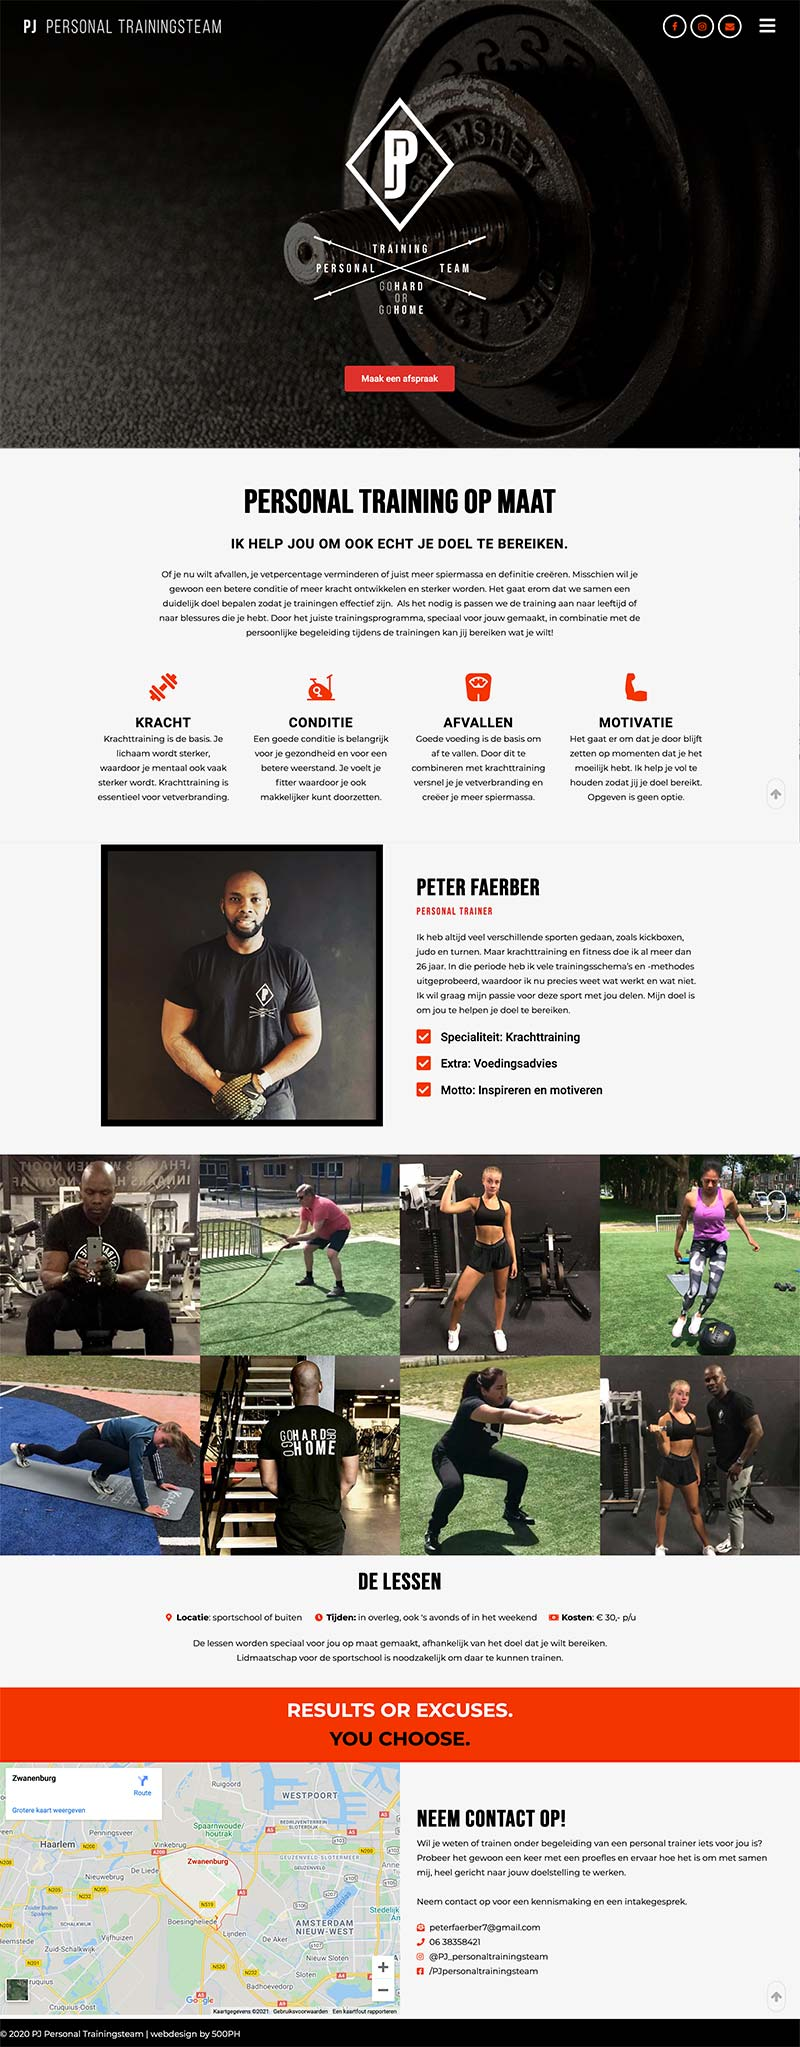 PJ Personal Trainer   website